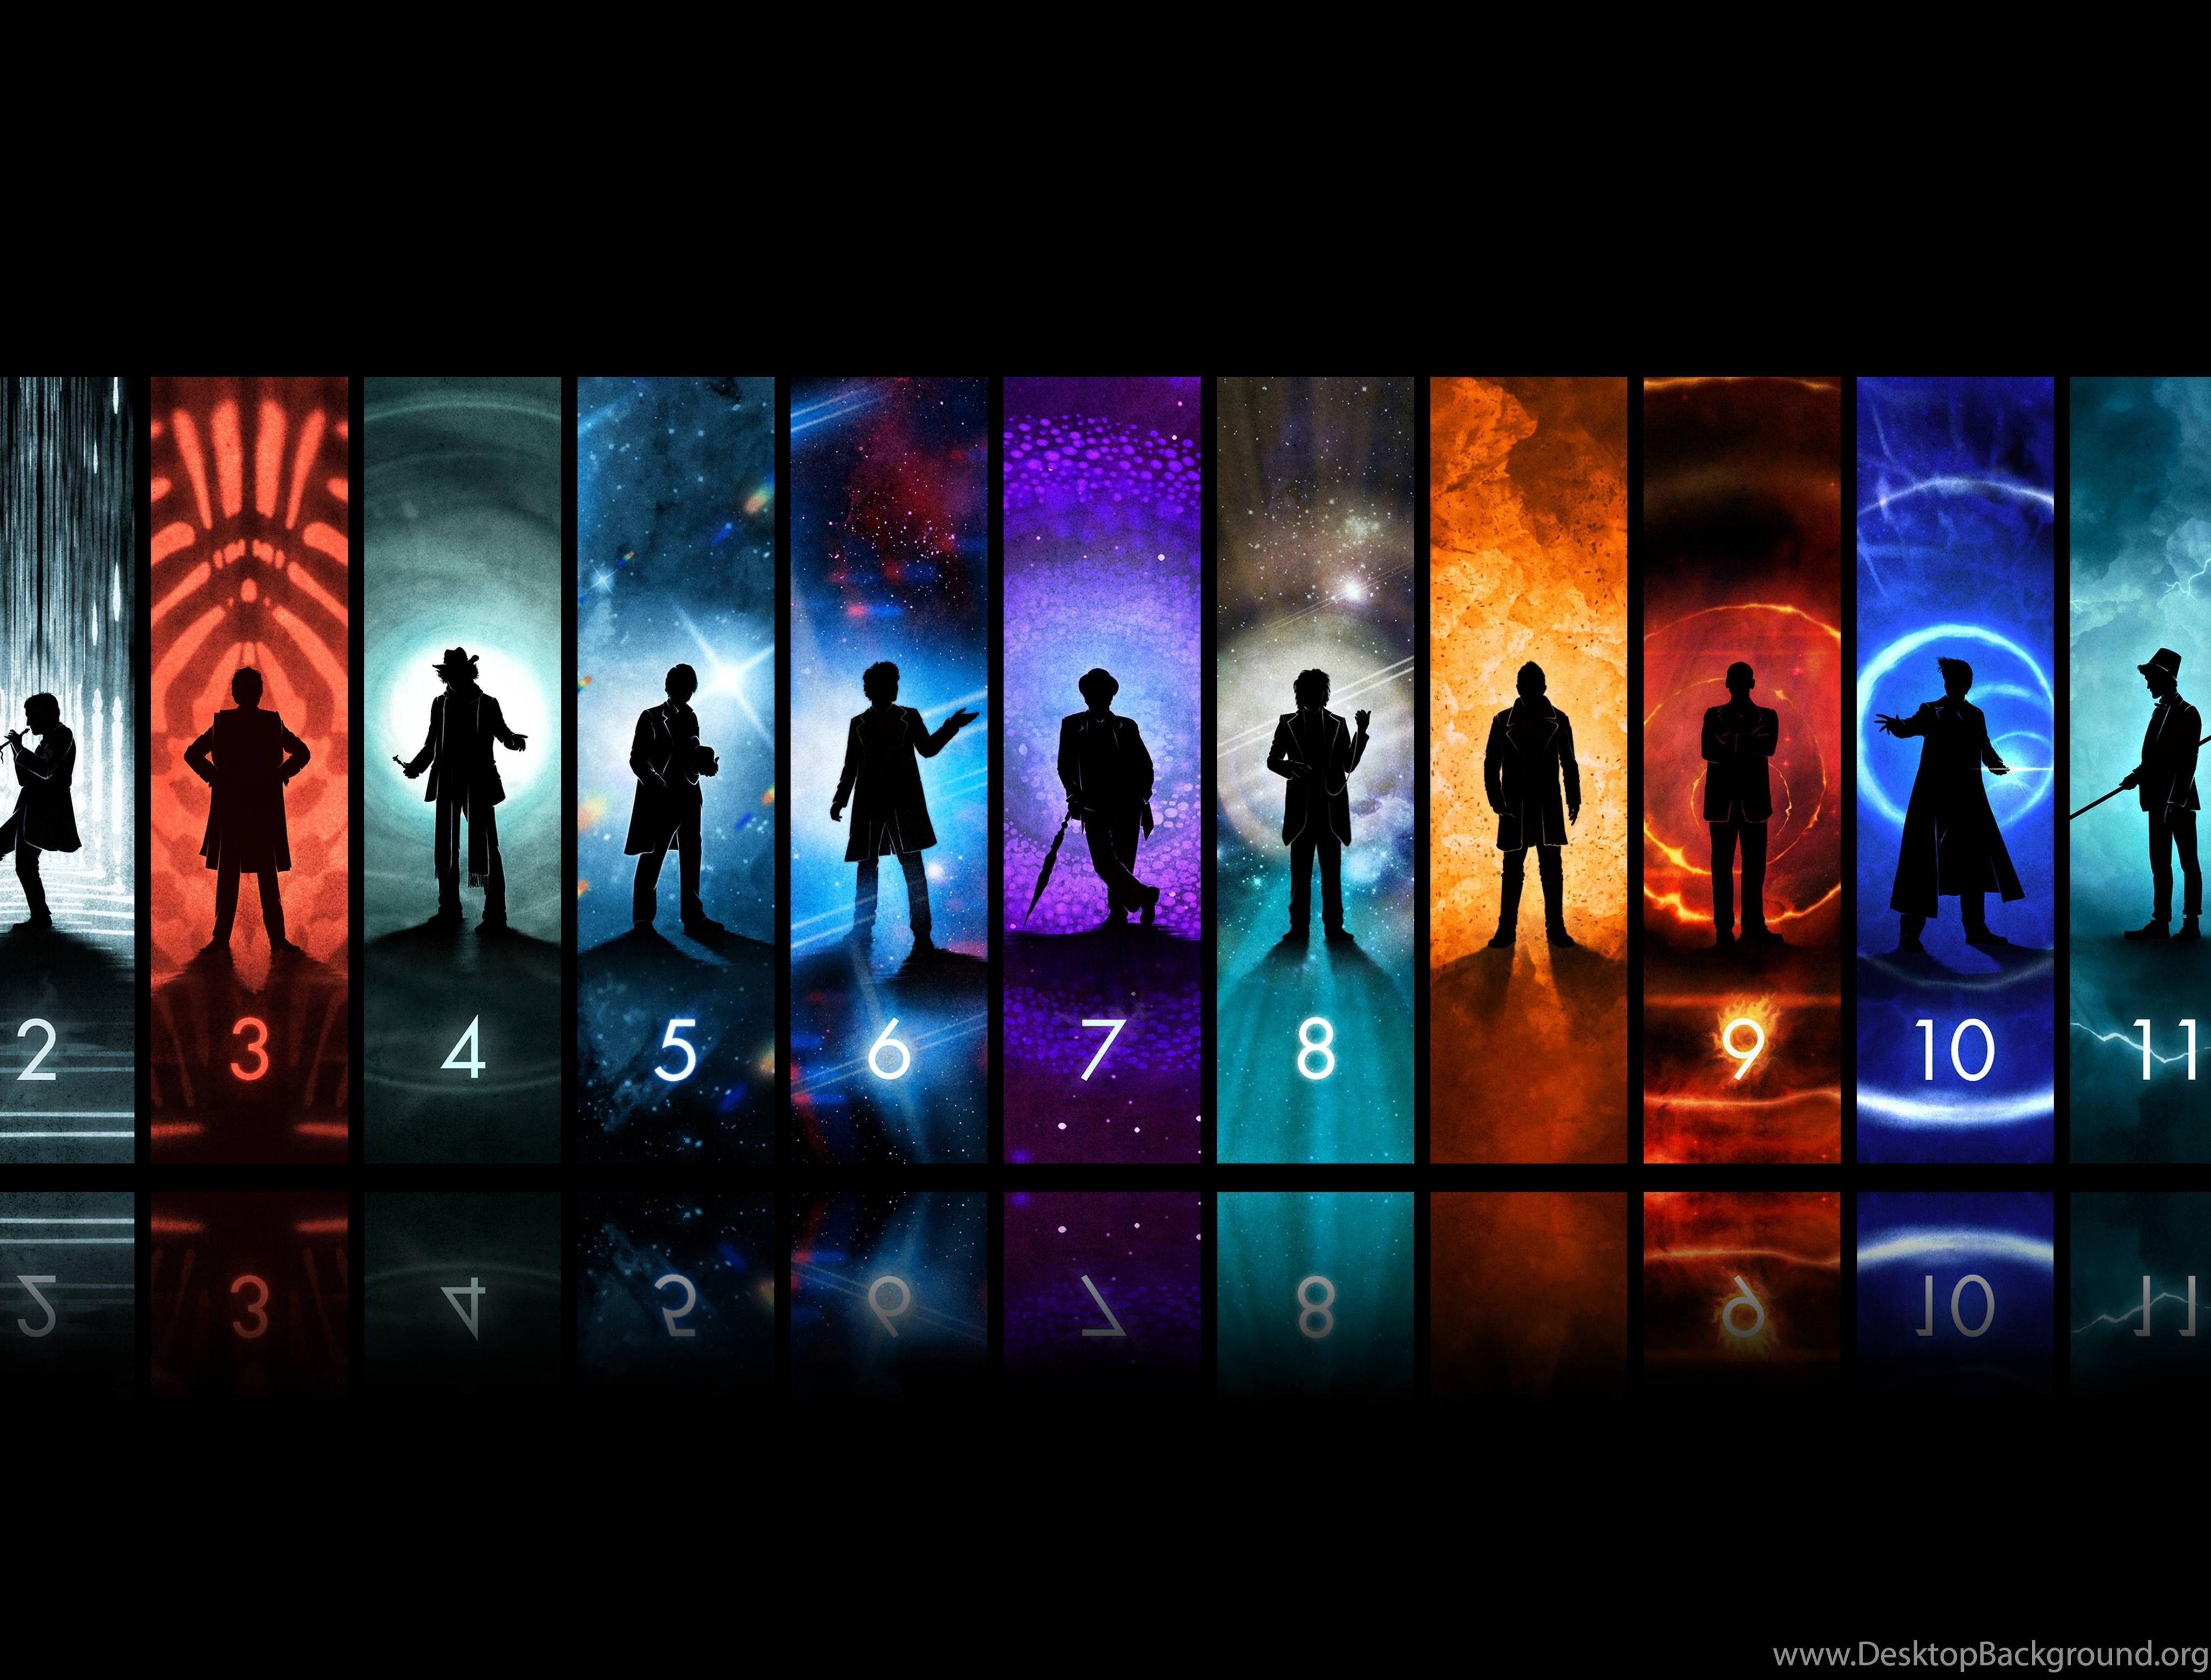 4k Dual Screen Wallpaper Picserio Doctor Who Cover 4096x3112 Download Hd Wallpaper Wallpapertip